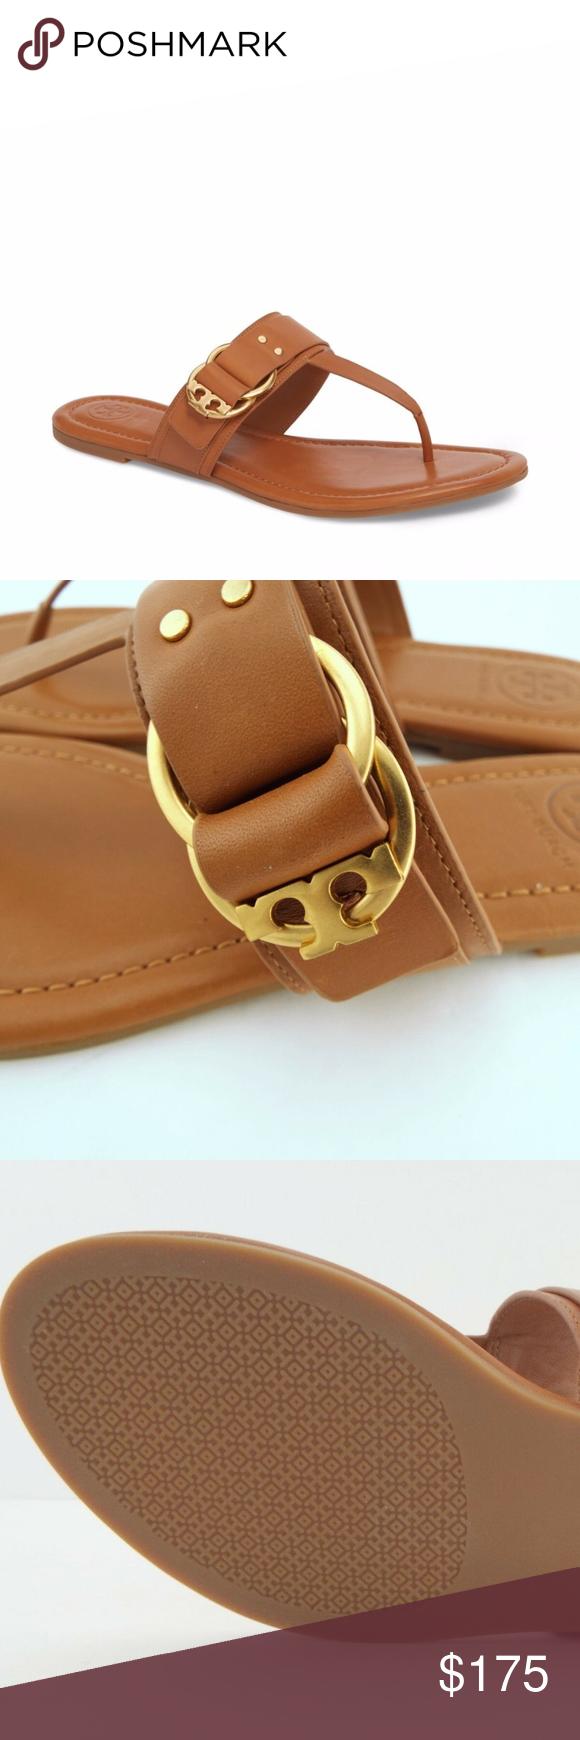 0cec68e00de New Tory Burch Marsden Flat Thong Sandal Size 10M New Tory Burch Marsden  Flat Thong Sandal Size 10M Details  Double-ring T logo hardware details  this thong ...